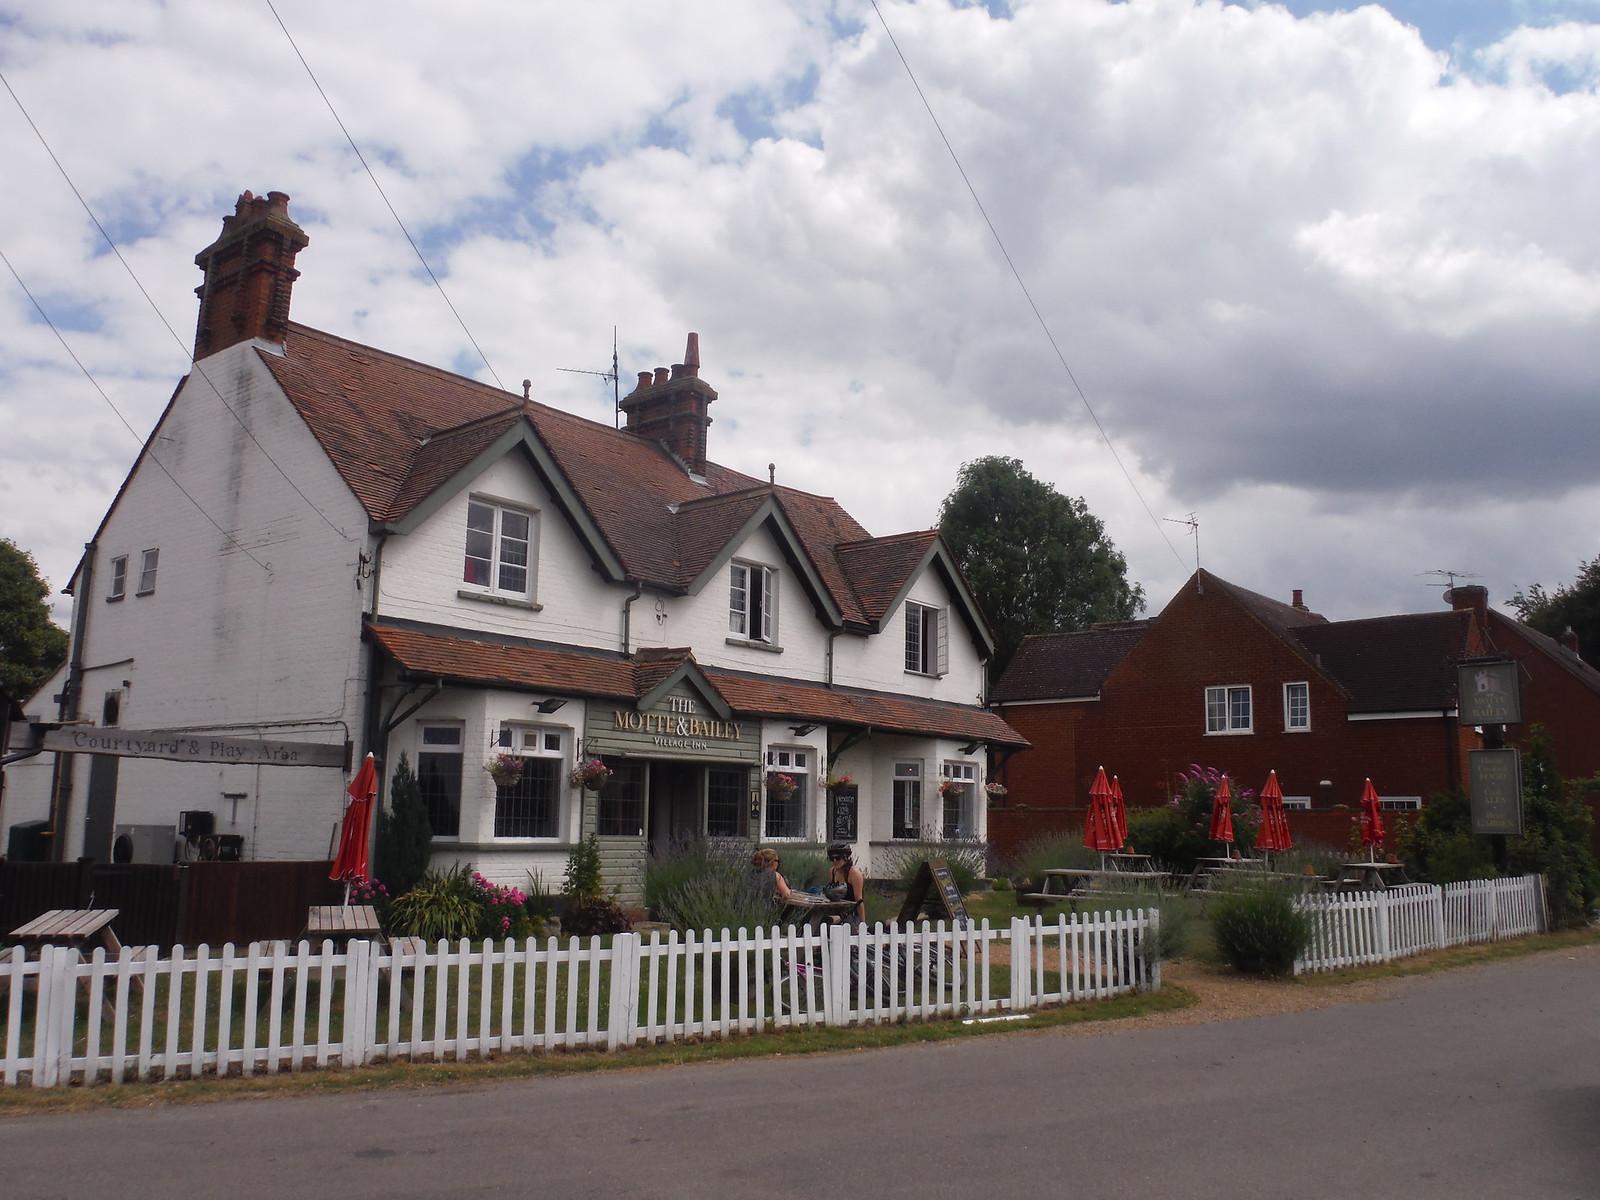 The Motte & Bailey pub, Pirton SWC Walk 233 - Arlesey to Letchworth Garden City